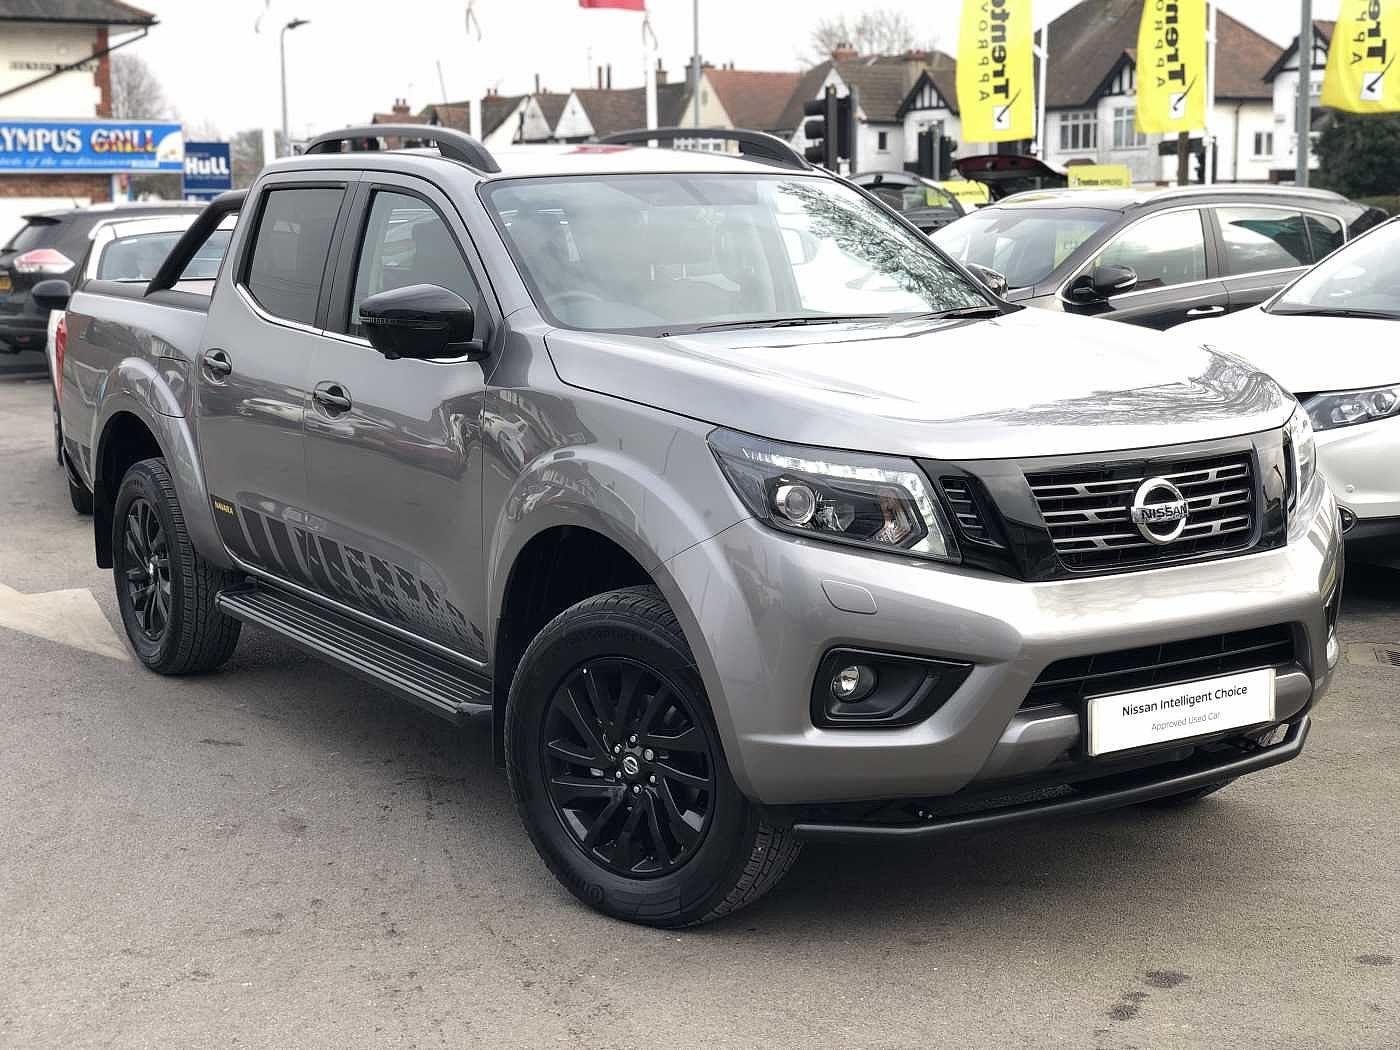 Used Cars for sale | Trenton (Hull) Ltd